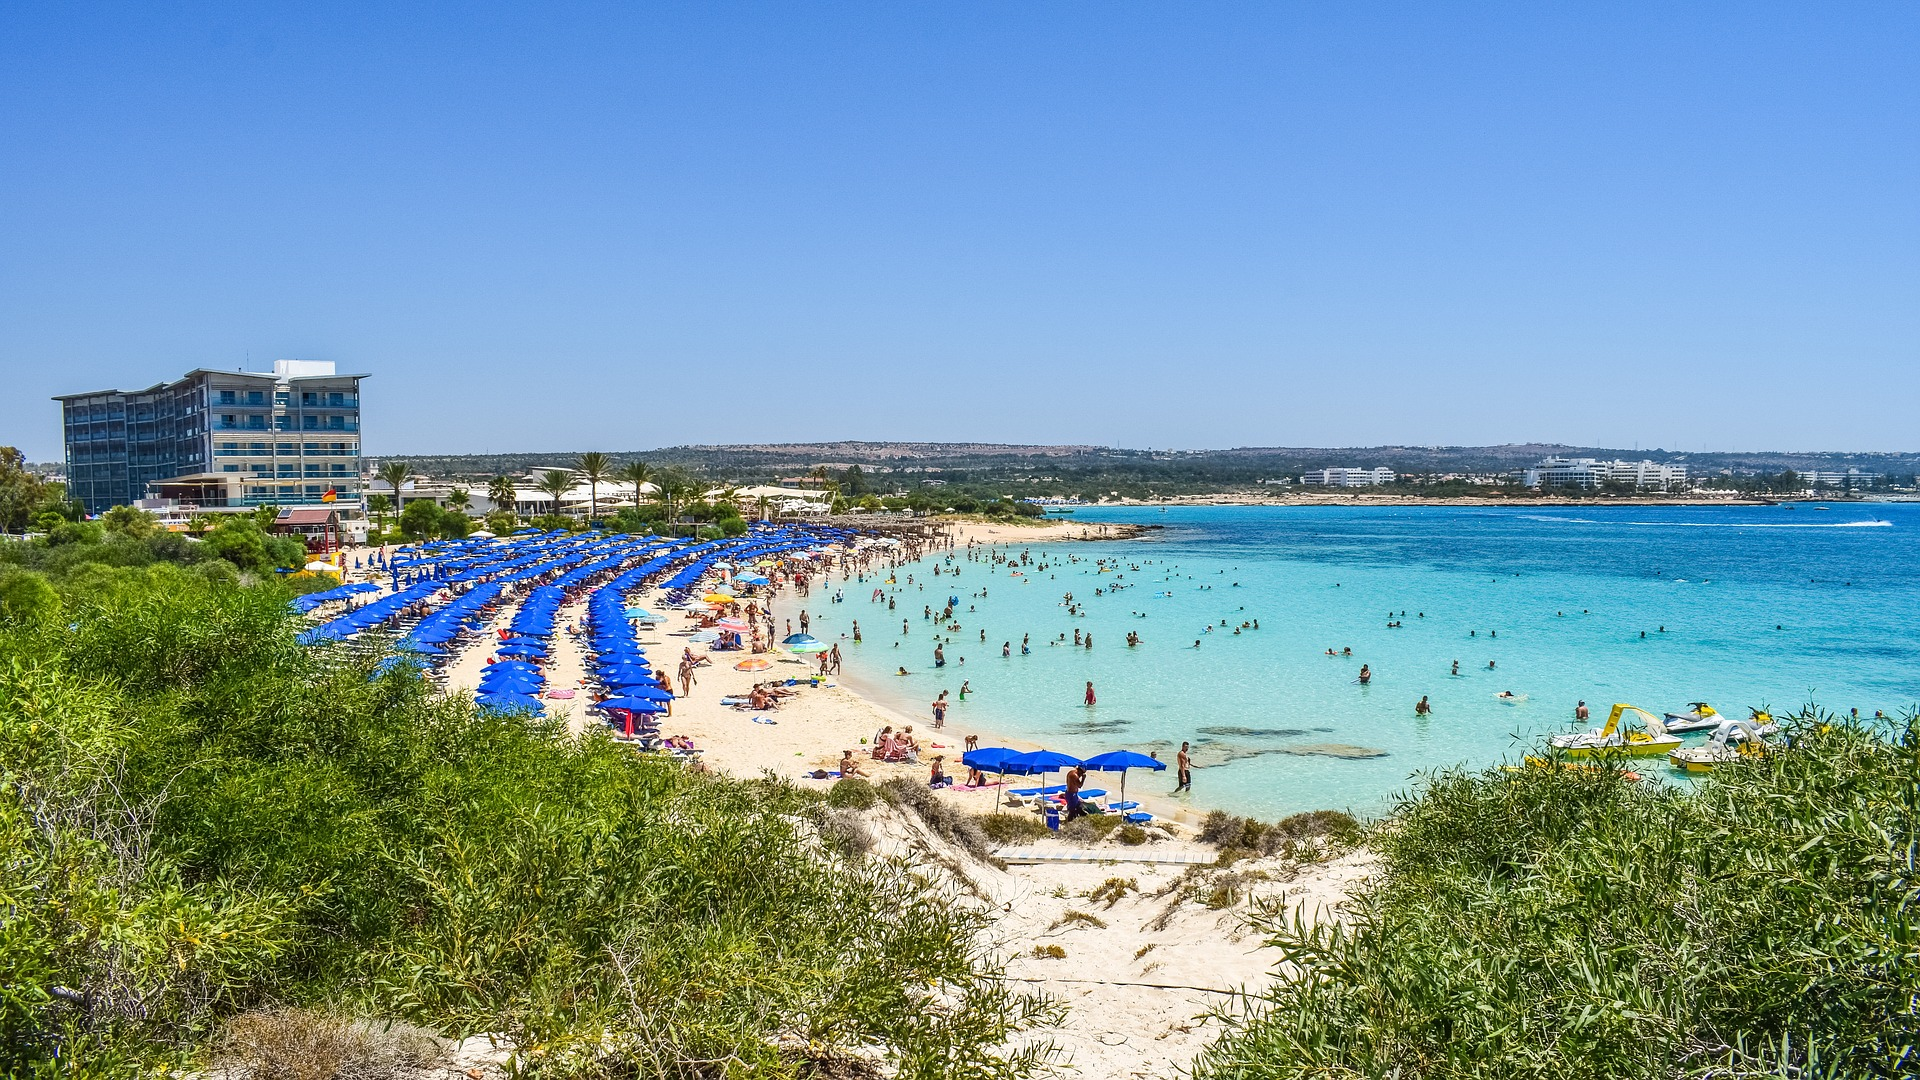 Zypern - Ayia Napa - Makronissos Beach - Ein traumhafter Sandstrand im Ort Ayia Napa im Distrikt Famagusta.